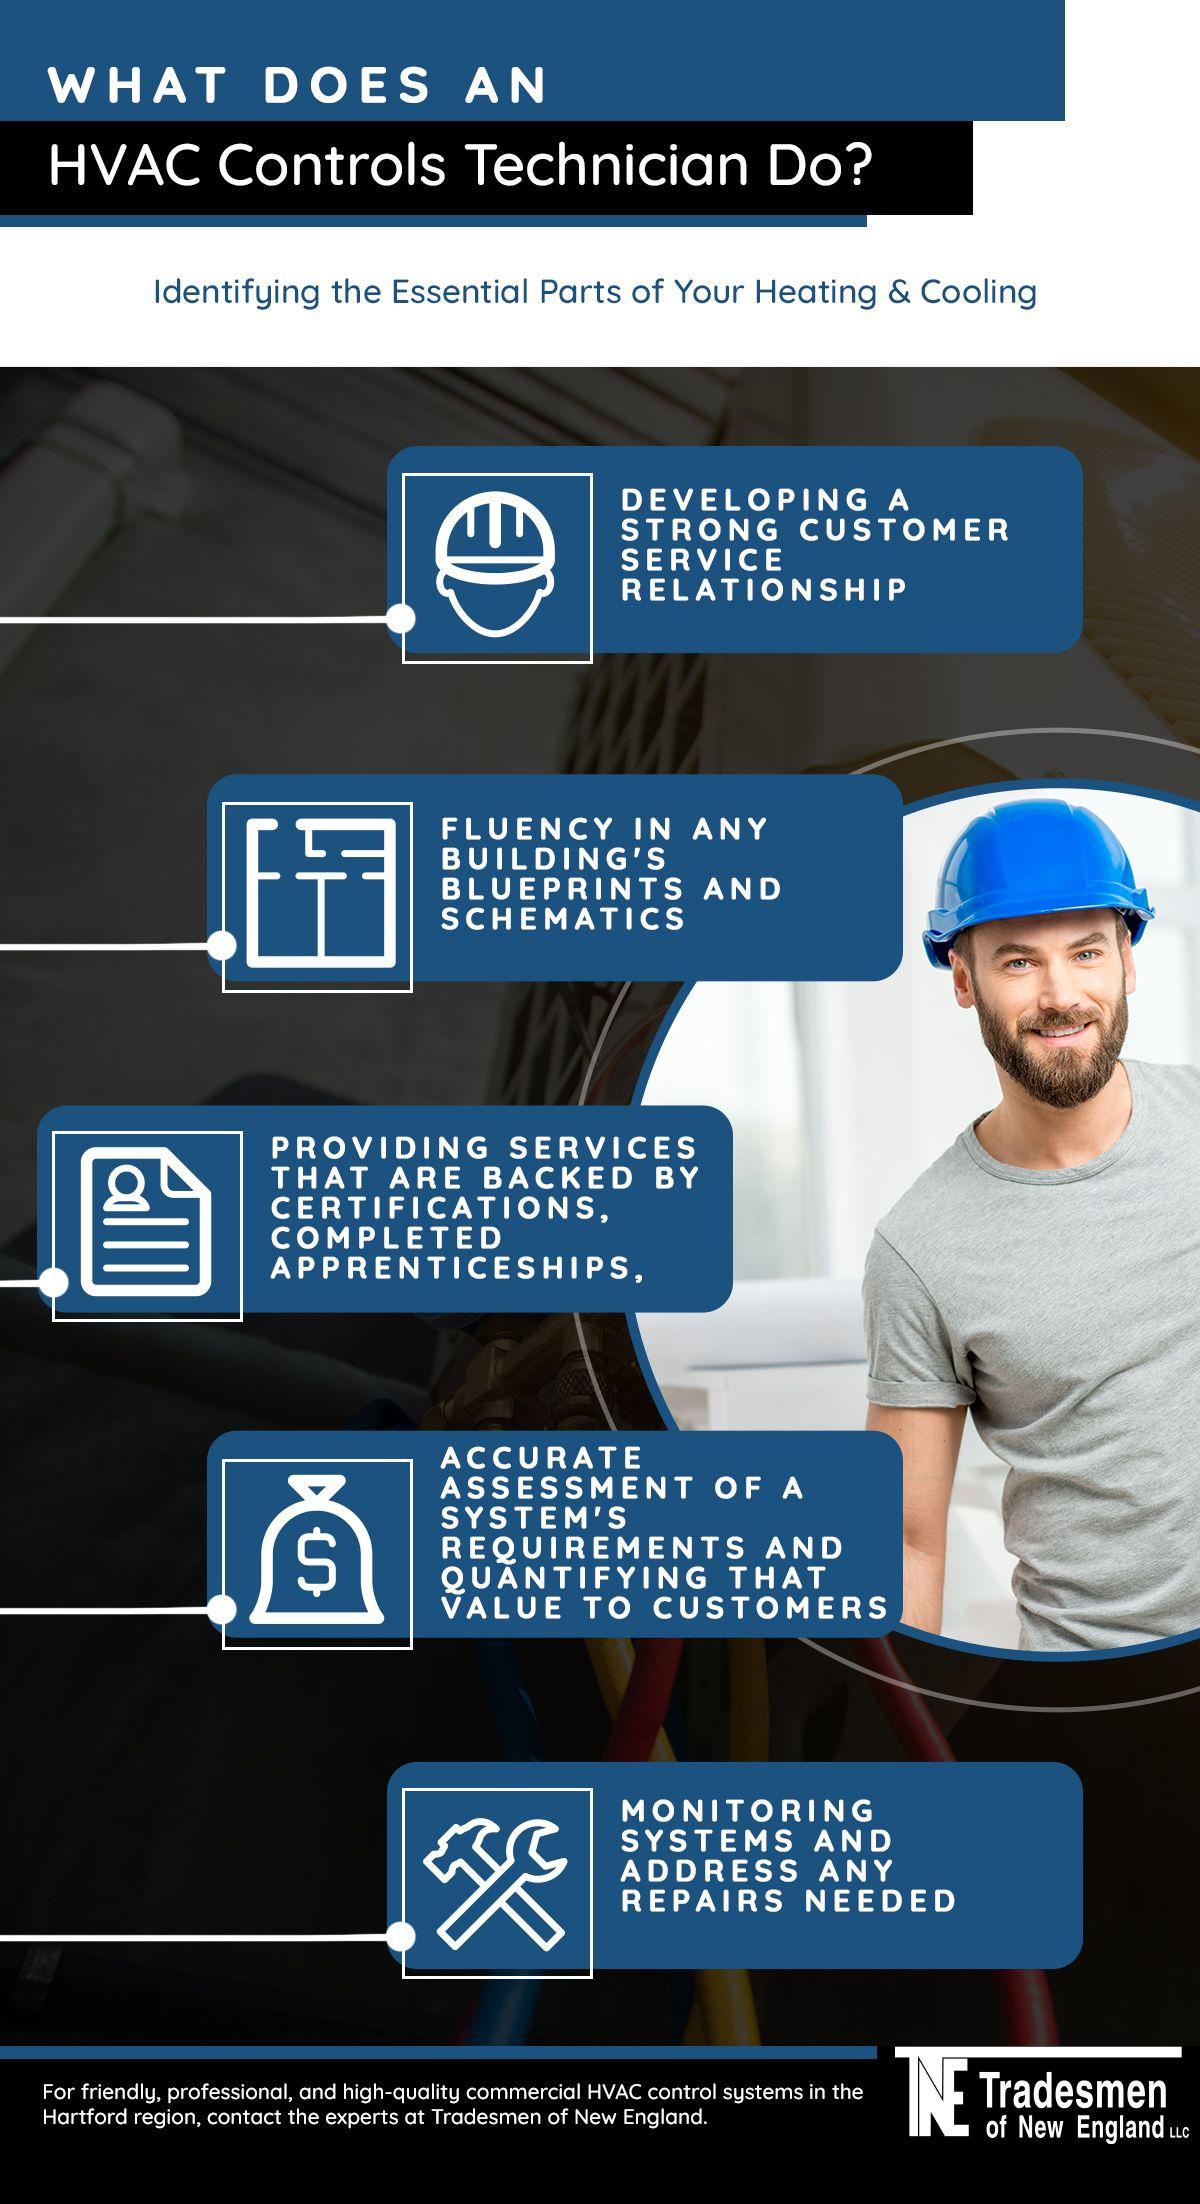 What Does an HVAC Controls Technician Do.jpg